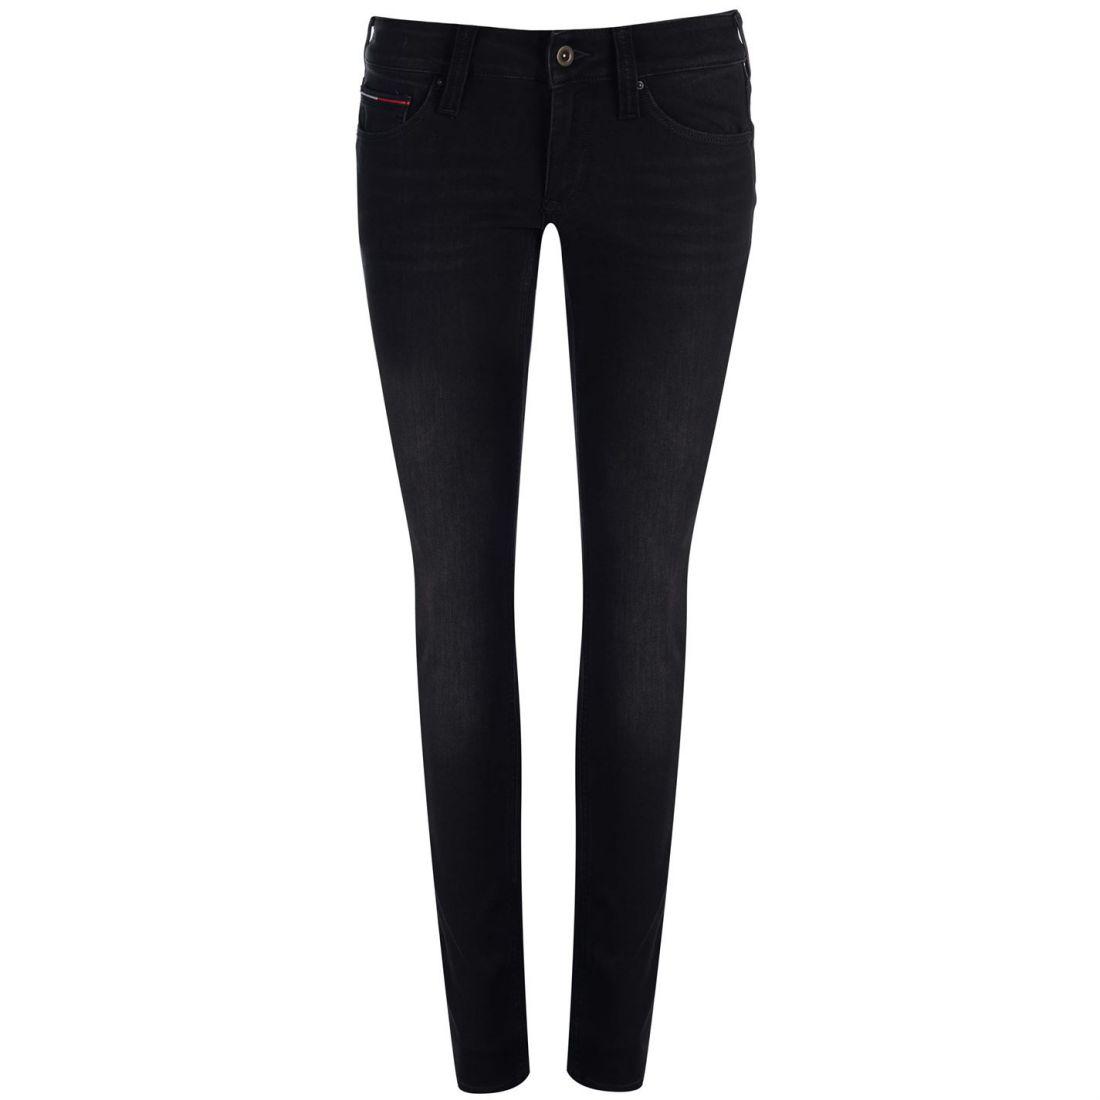 ei myyntiveroa paras valinta alennusmyynti Details about Womens HILFIGER DENIM Tommy Sophie LowRise Skinny Jeans New